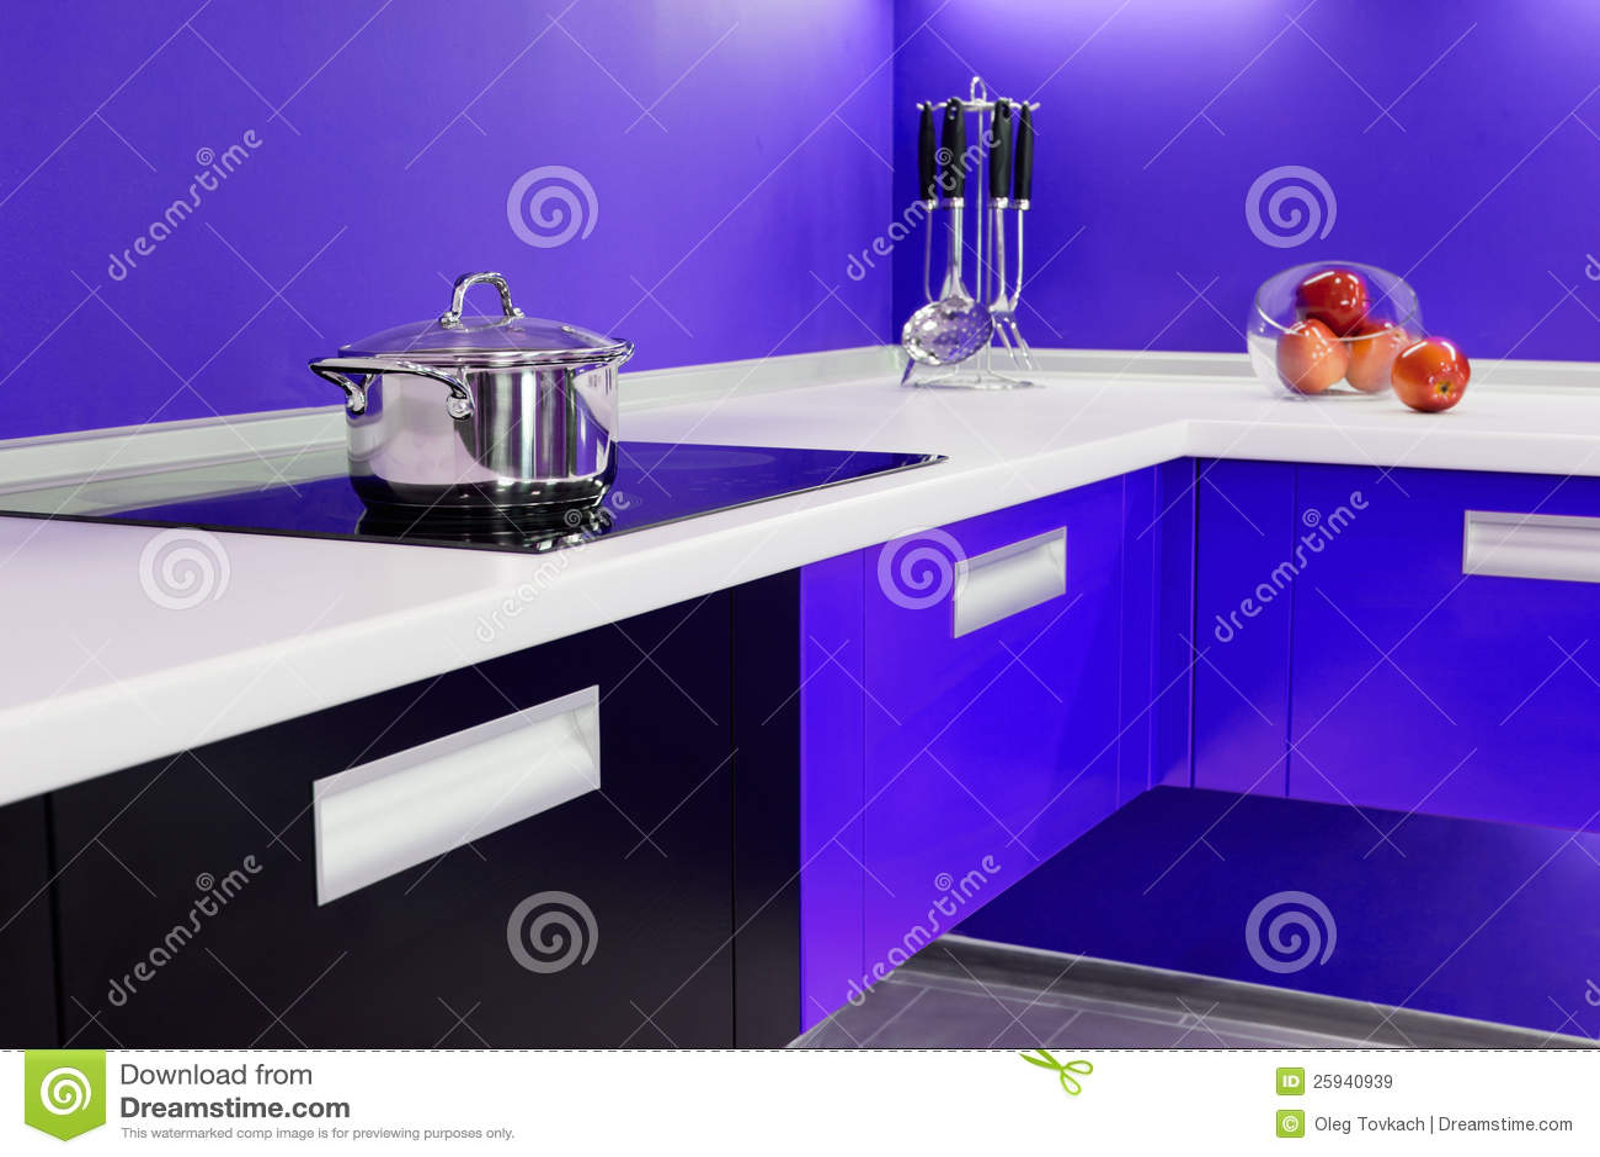 Moderne Blauw Keuken : Blauw wit keuken modern binnenland stock afbeelding afbeelding